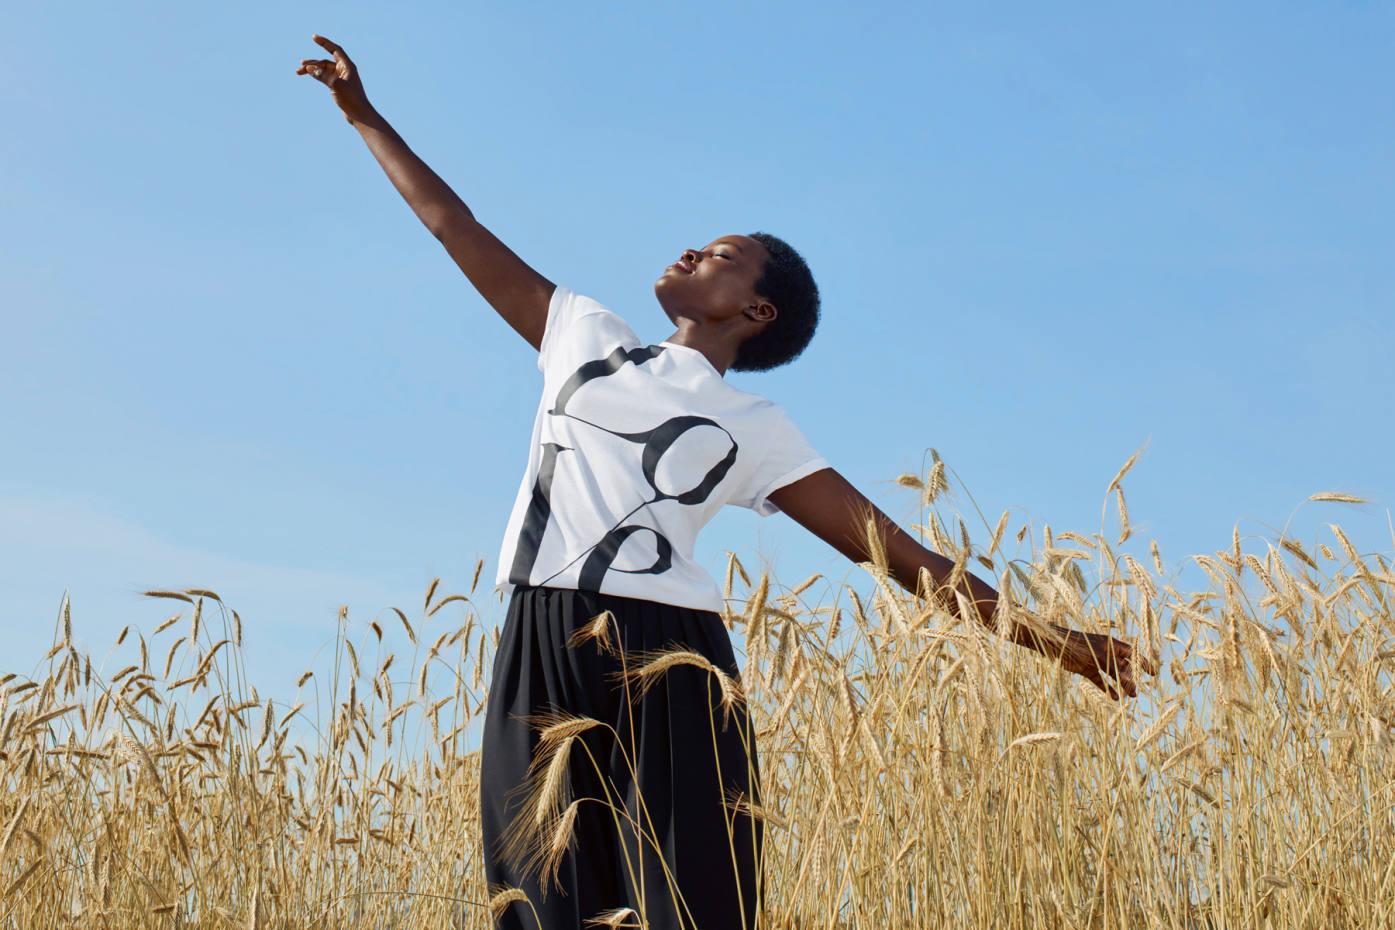 Michael Kors Love T-shirt, £30